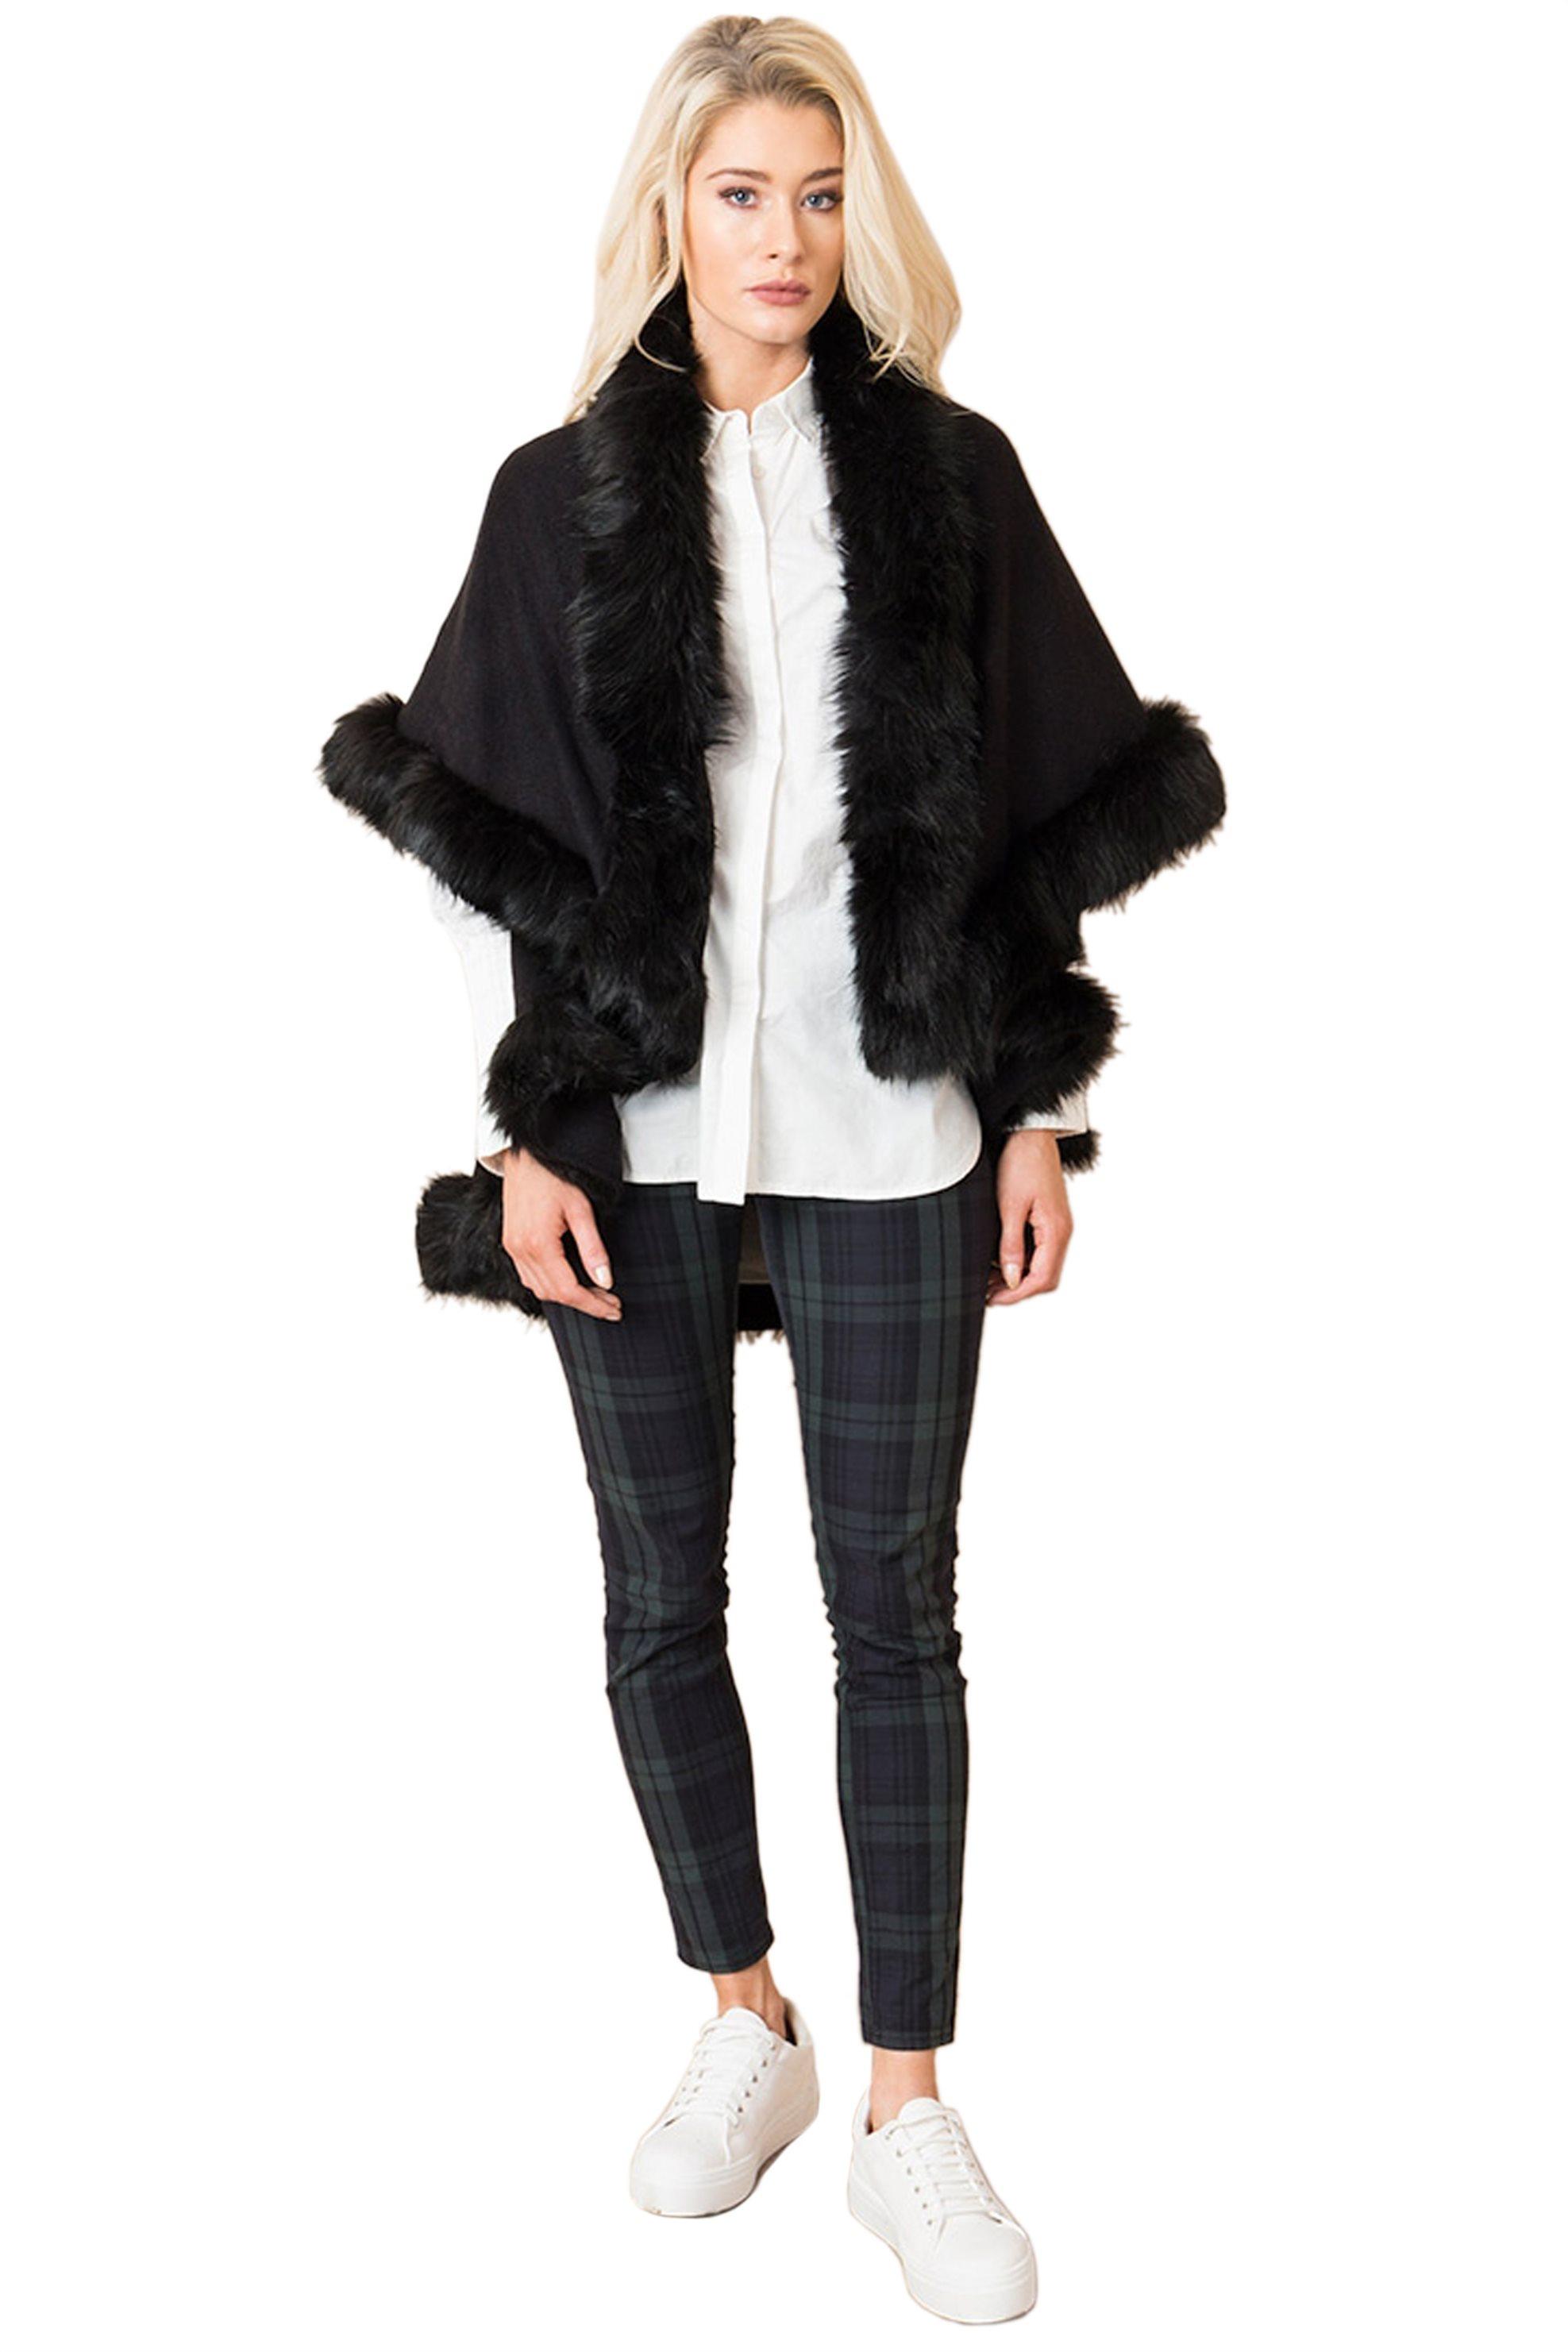 Pia Possini γυναικεία κάπα Anabelle με faux γούνα - ANA007 - Μαύρο γυναικα   ρουχα   πανωφόρια   κάπες